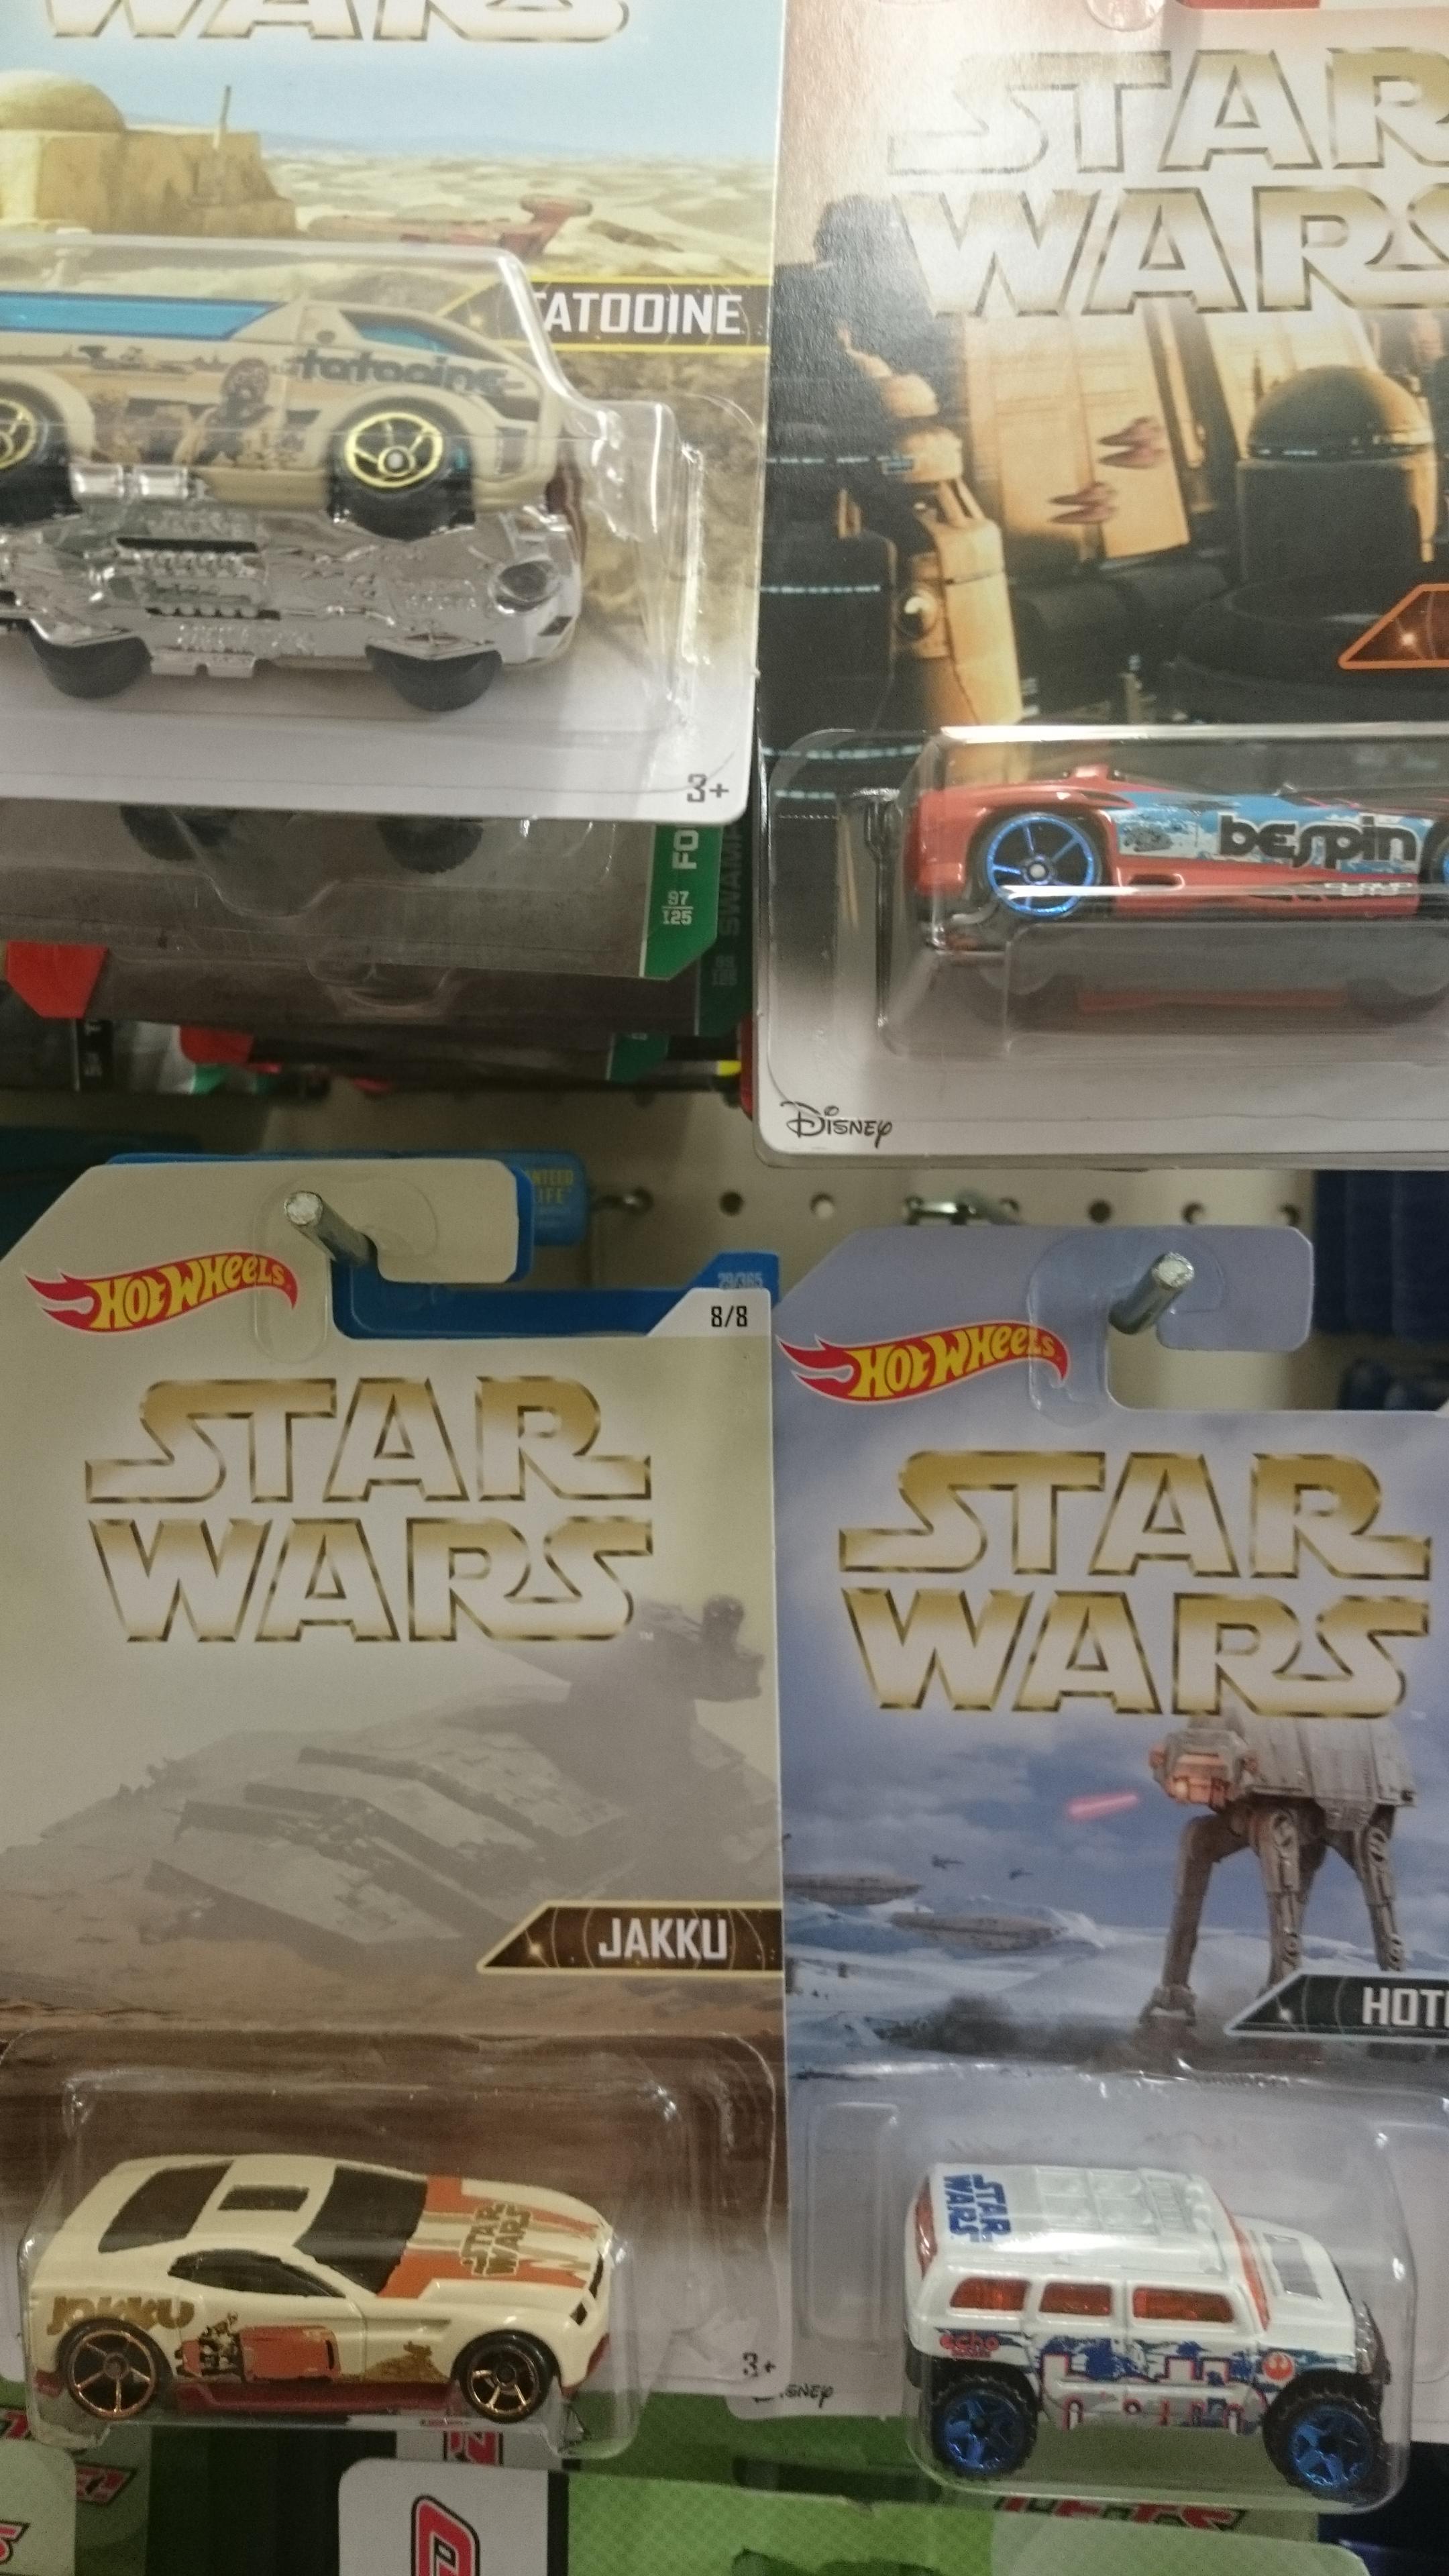 Star wars hotwheels £1.00 instore @ poundland